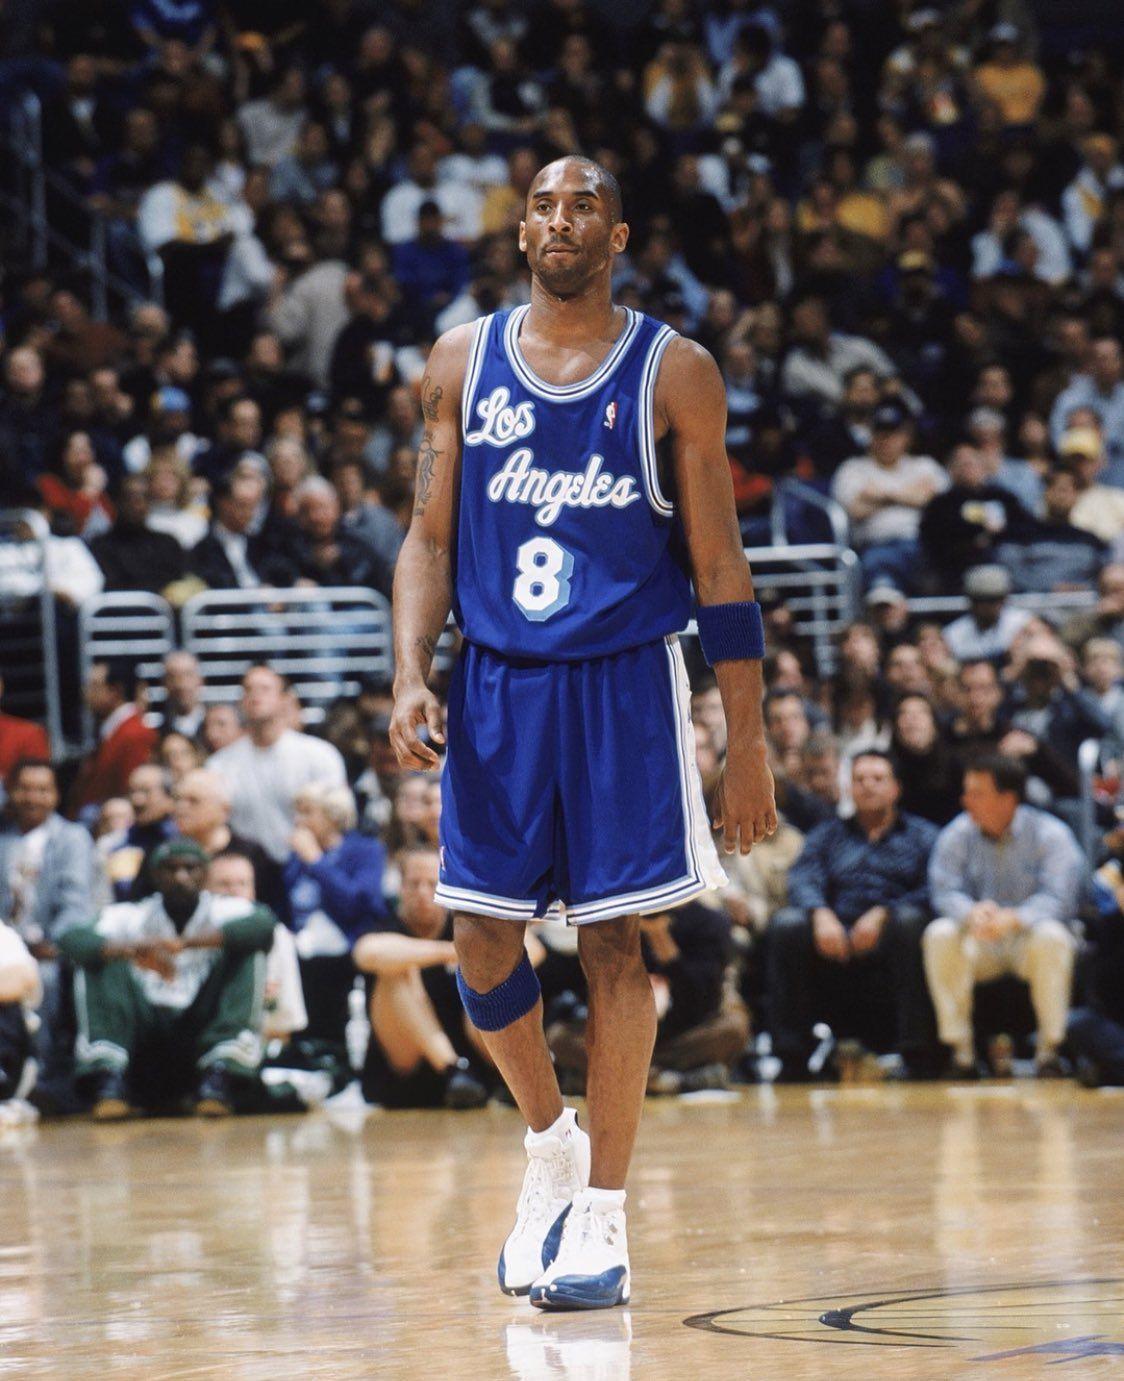 Timeless Sports on Twitter | Kobe bryant pictures, Kobe bryant ...